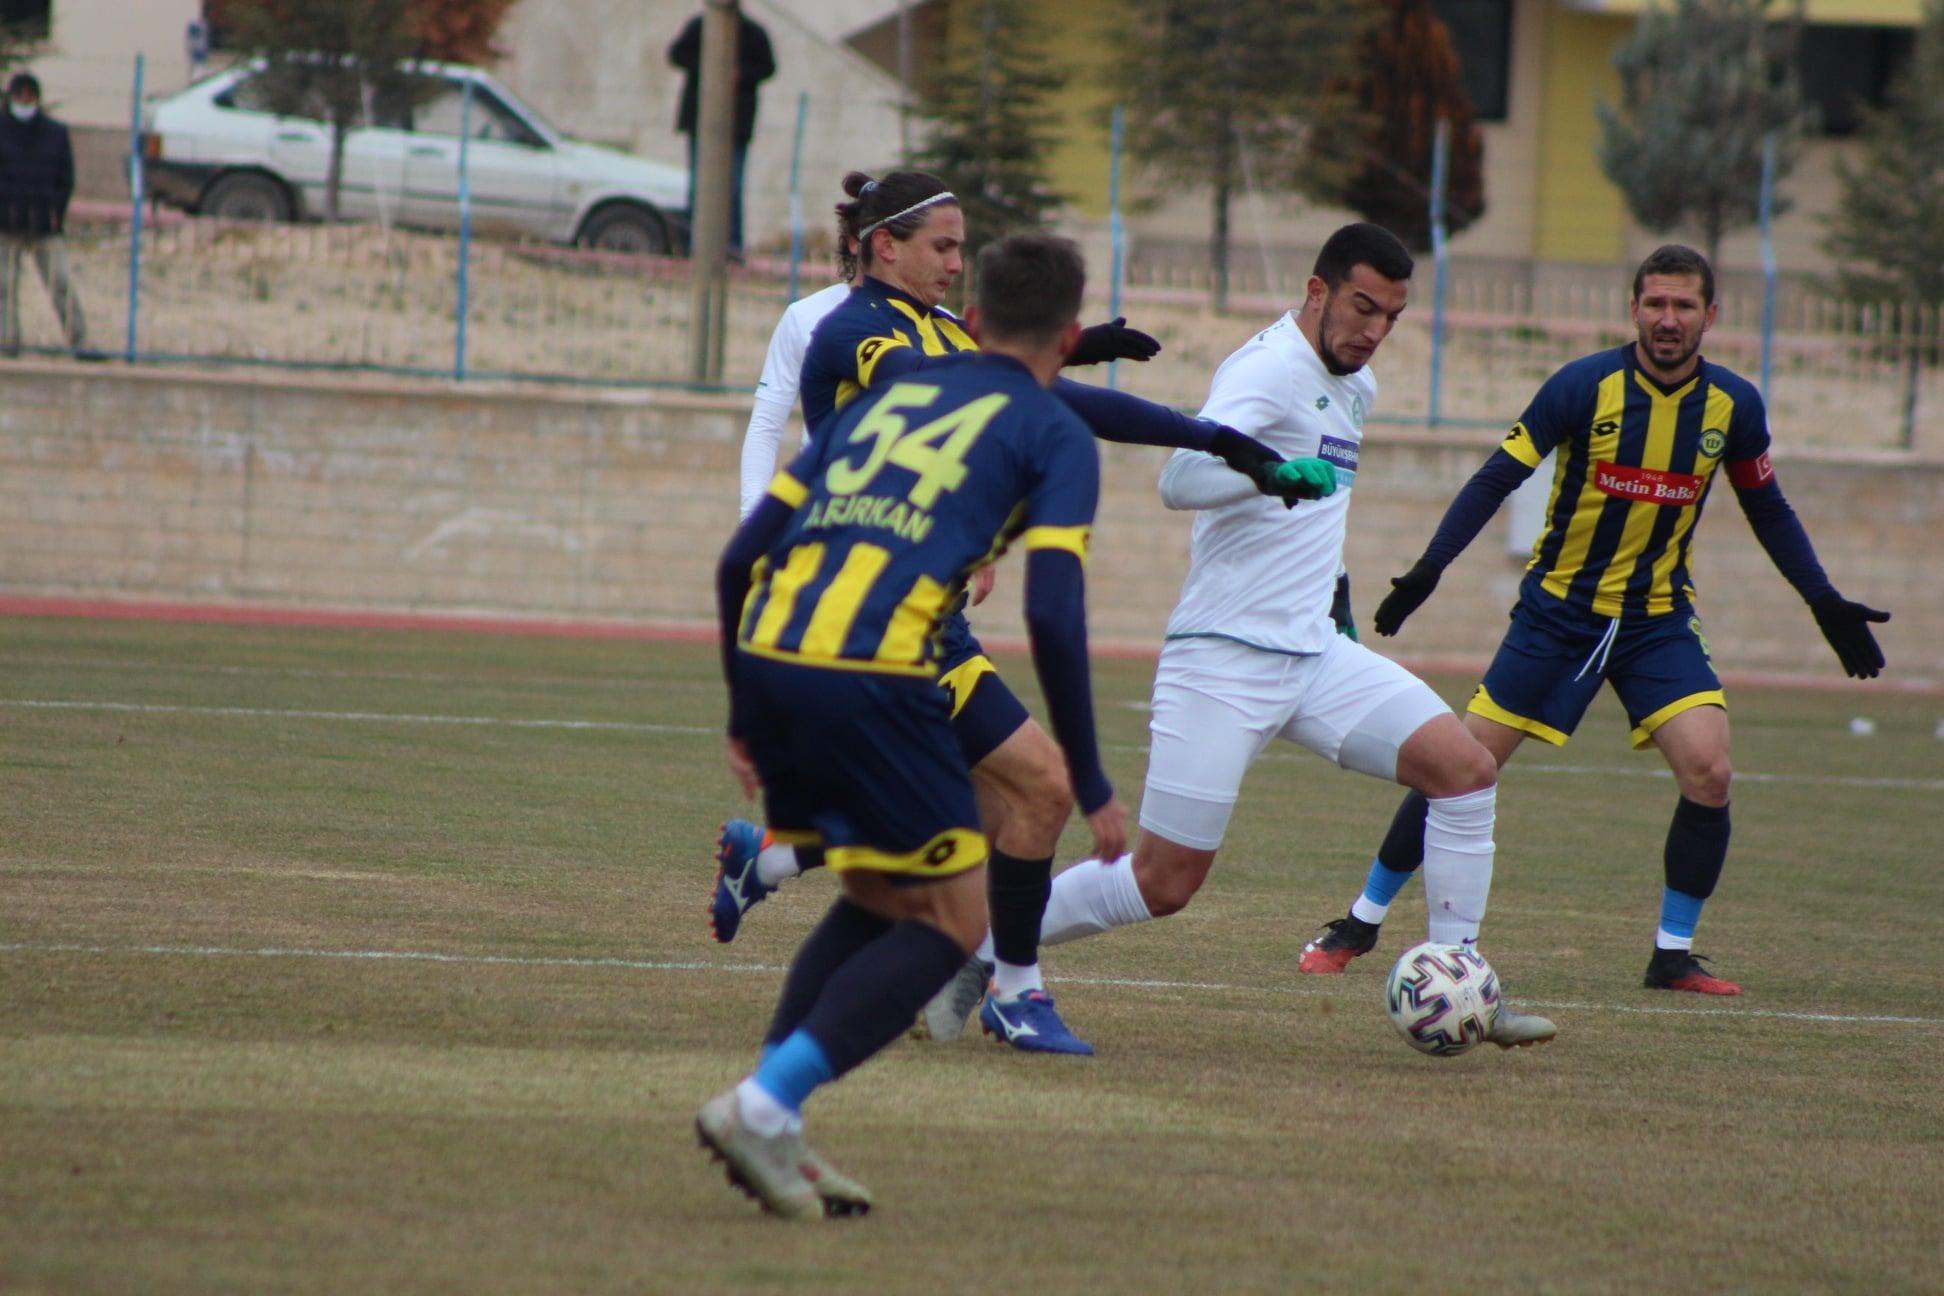 1922 Konyaspor 1 Tarsus U0130dman Yurdu 2